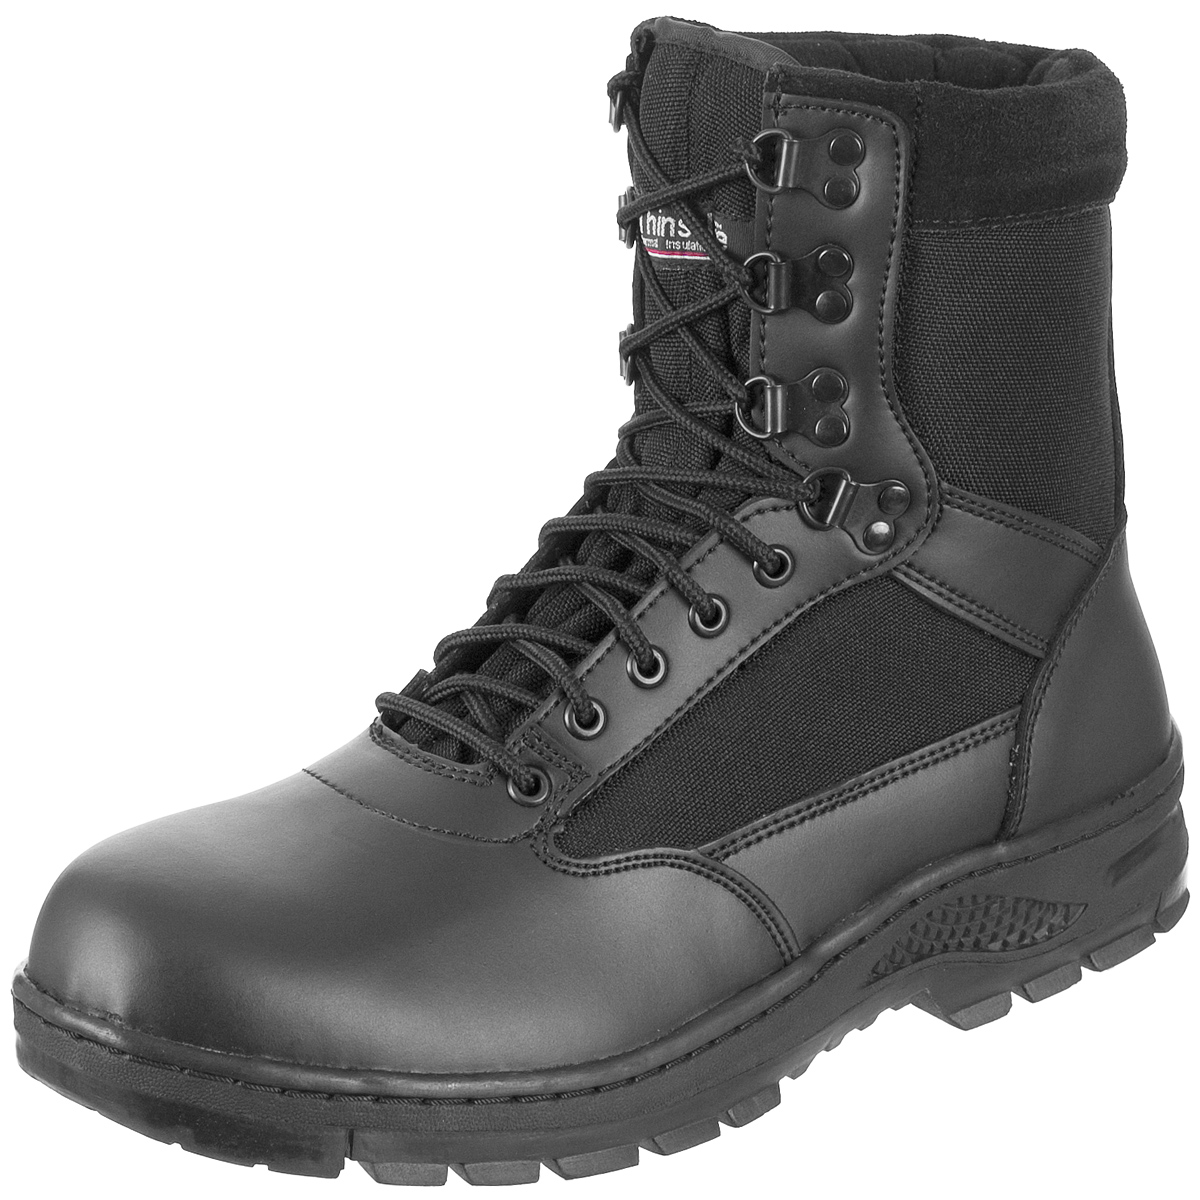 SurplUS Tactical Mens Police Security Footwear Leather ...